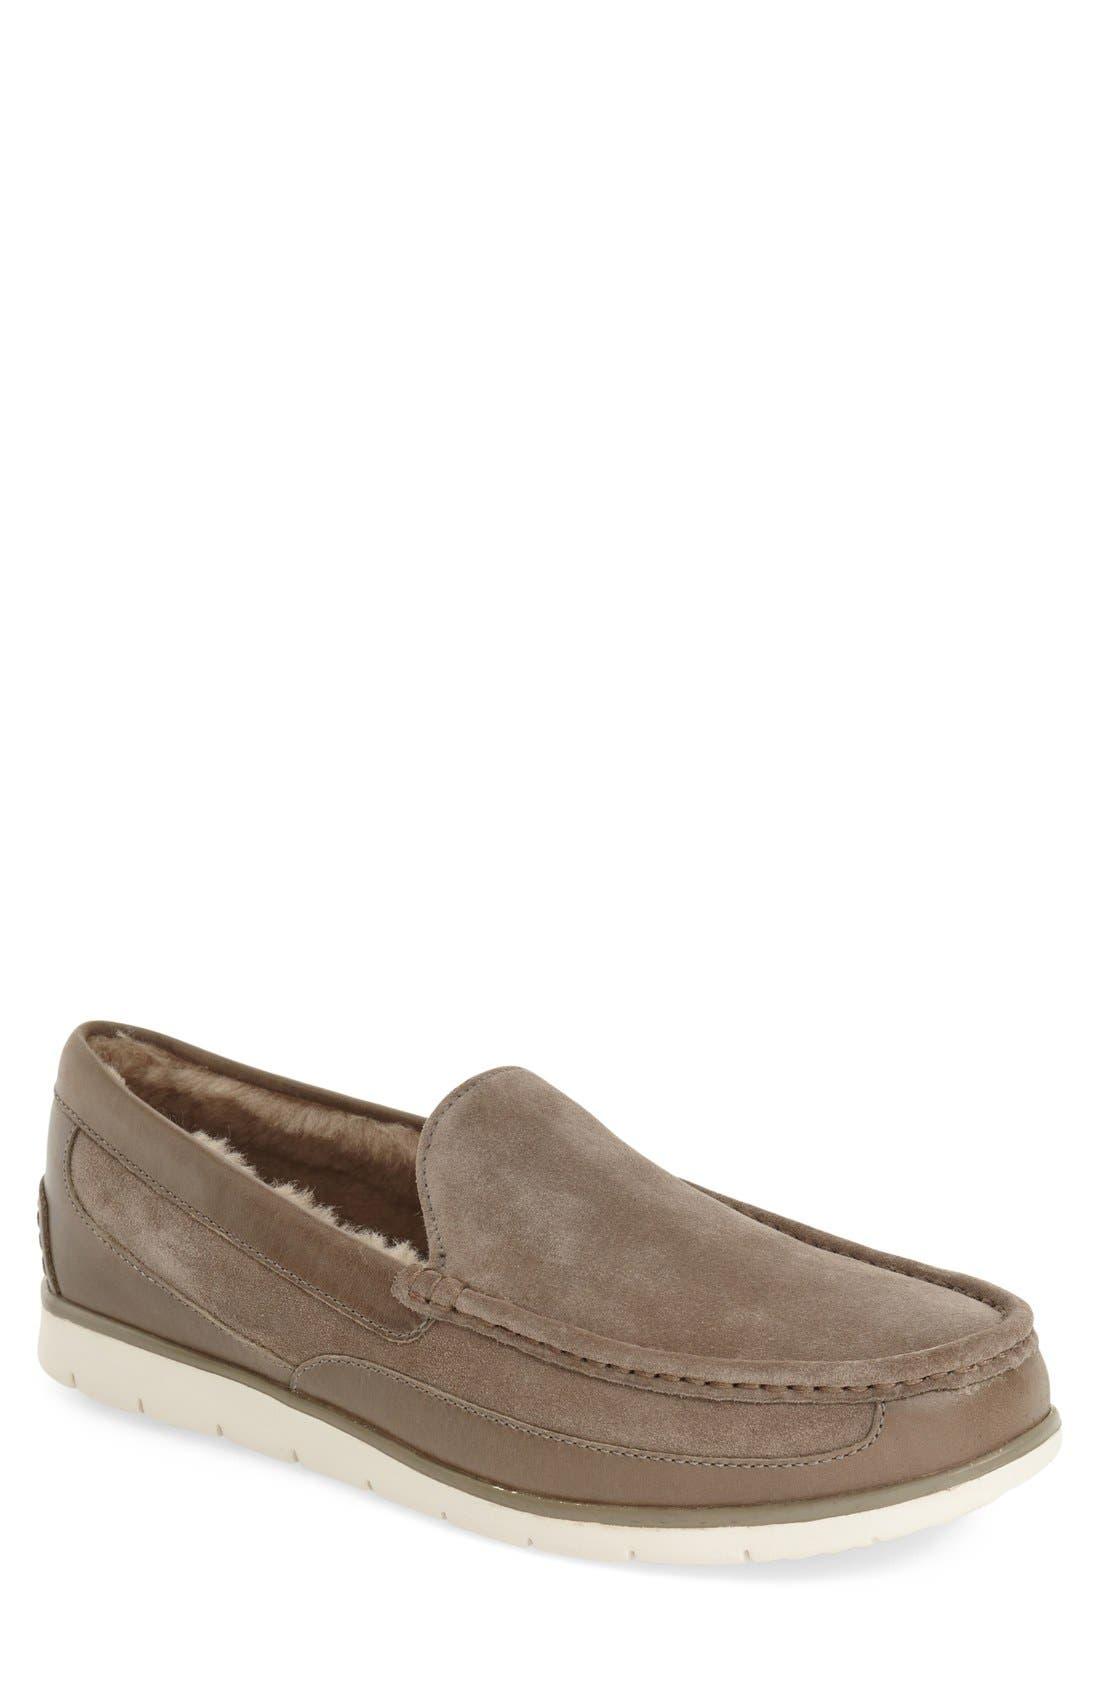 Main Image - UGG® Fascot Driving Shoe (Men)